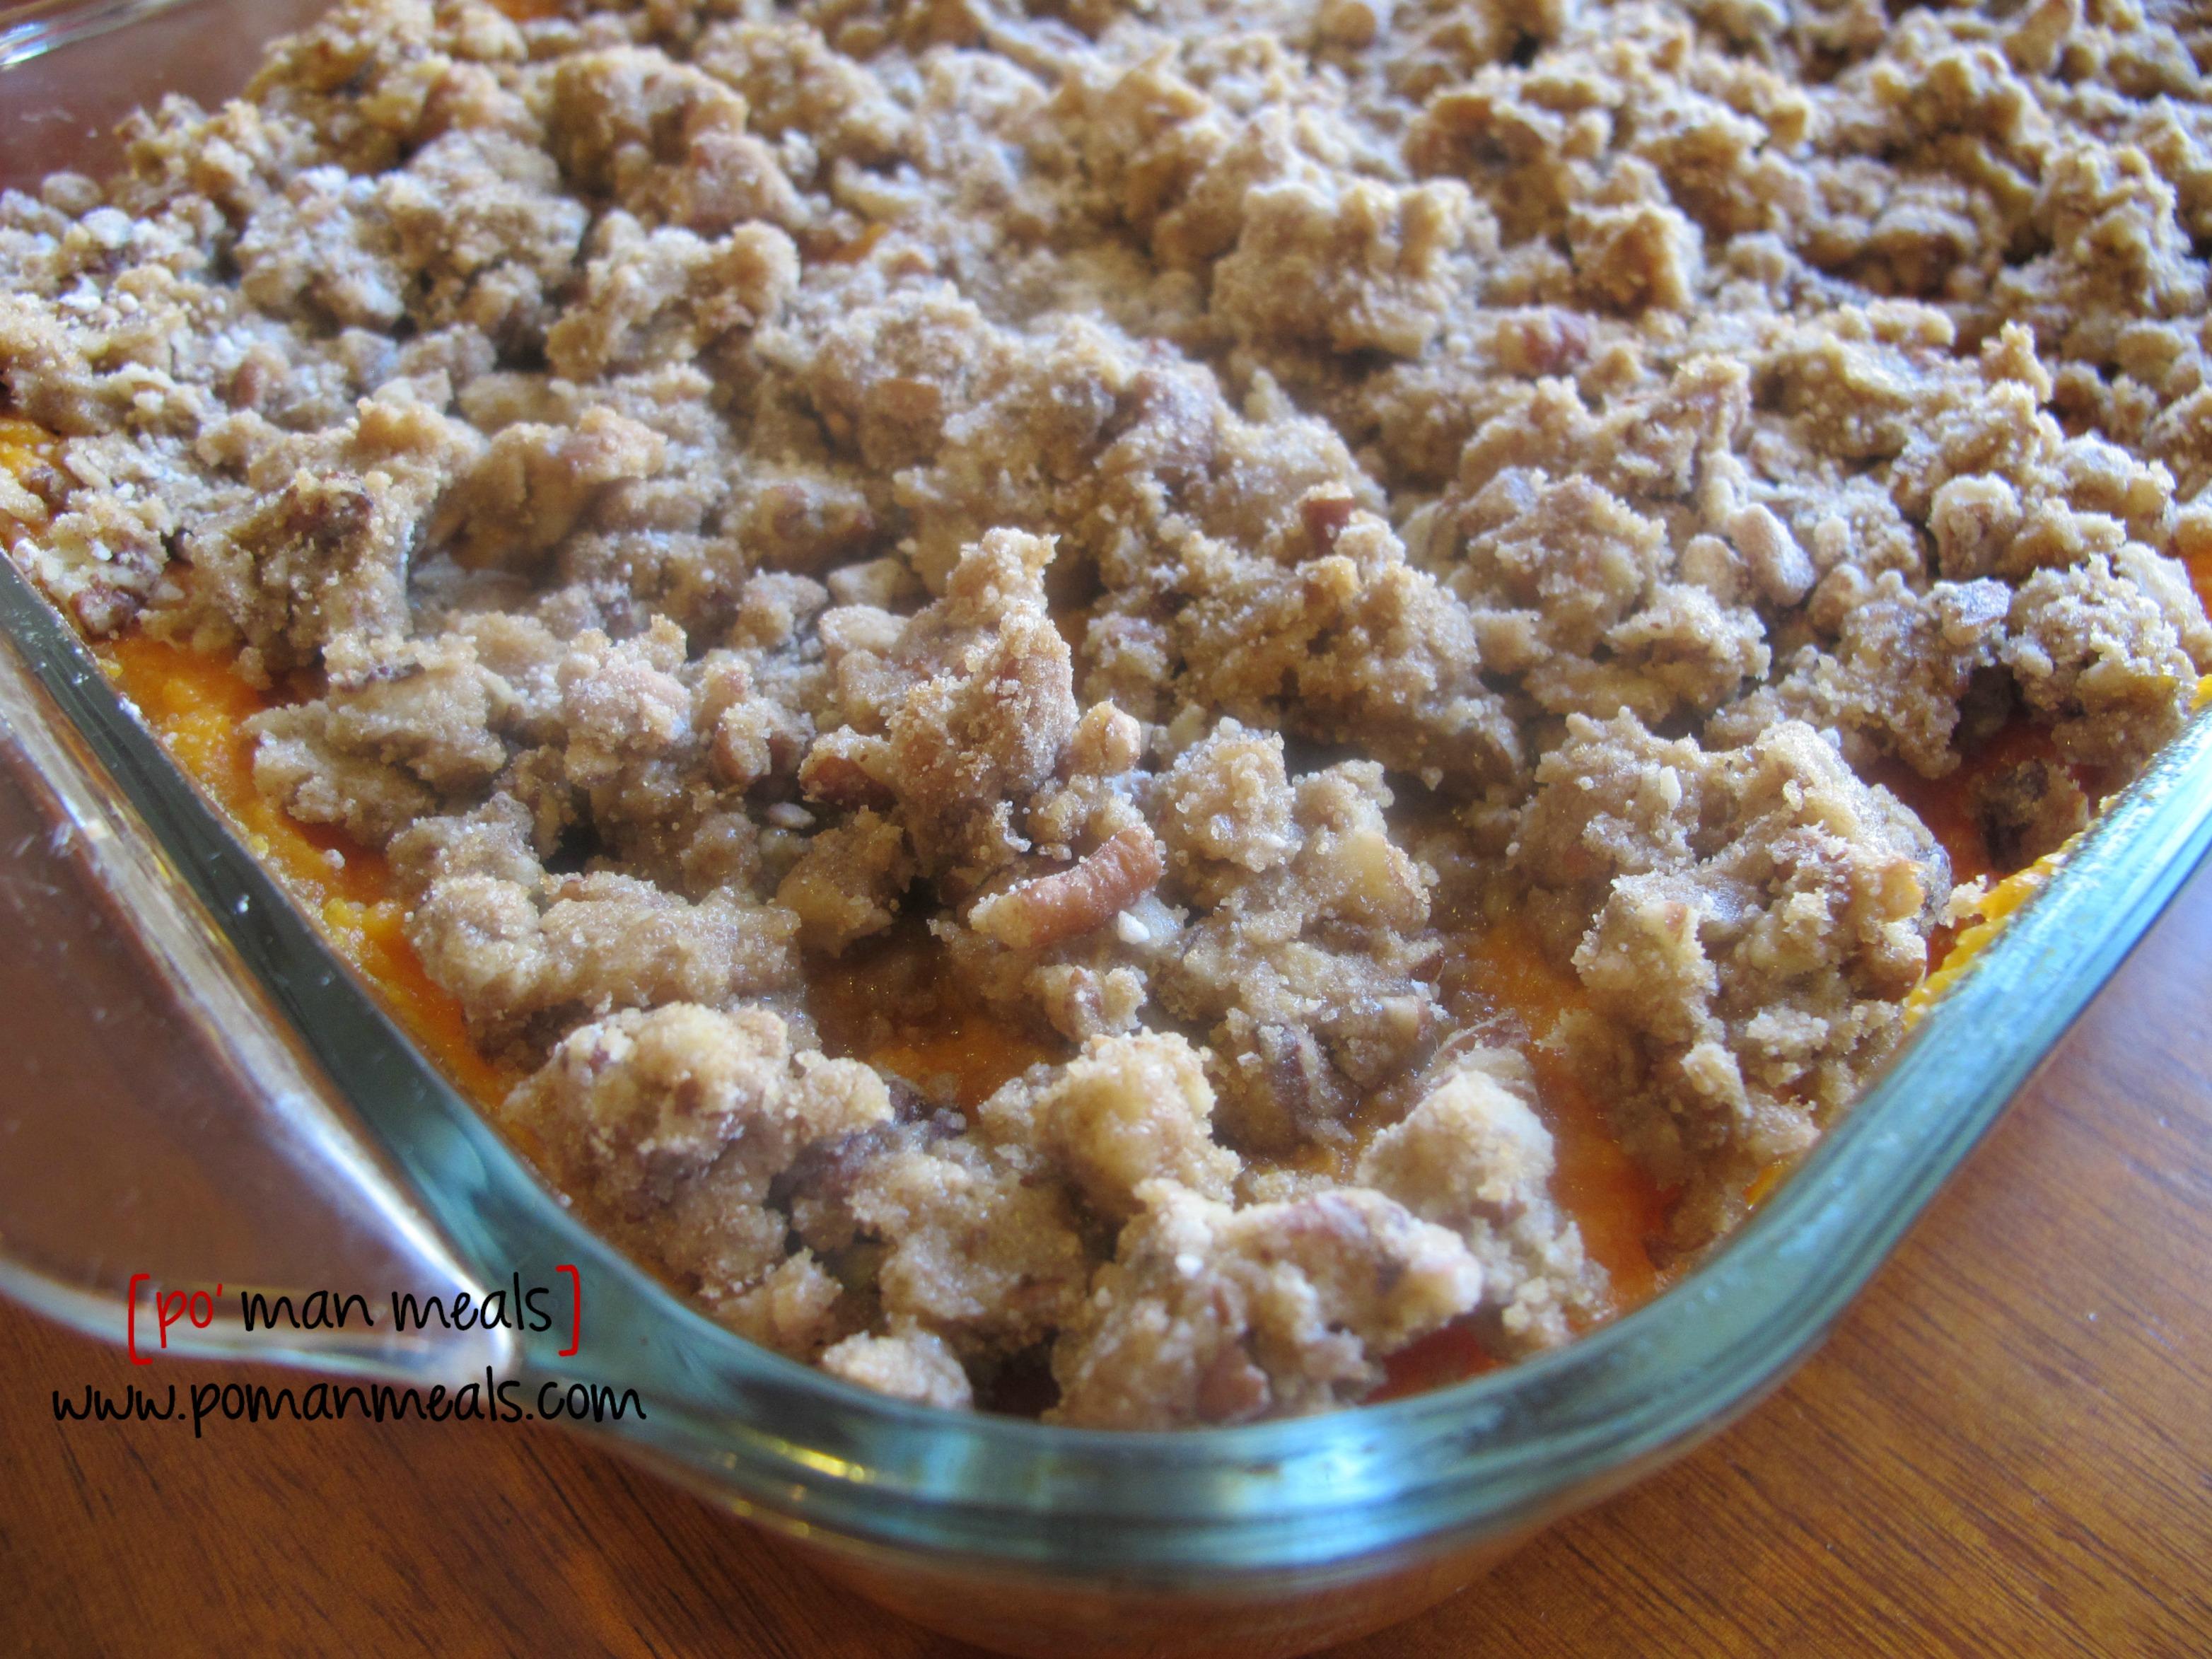 po' man meals - sweet potato casserole w/pecans